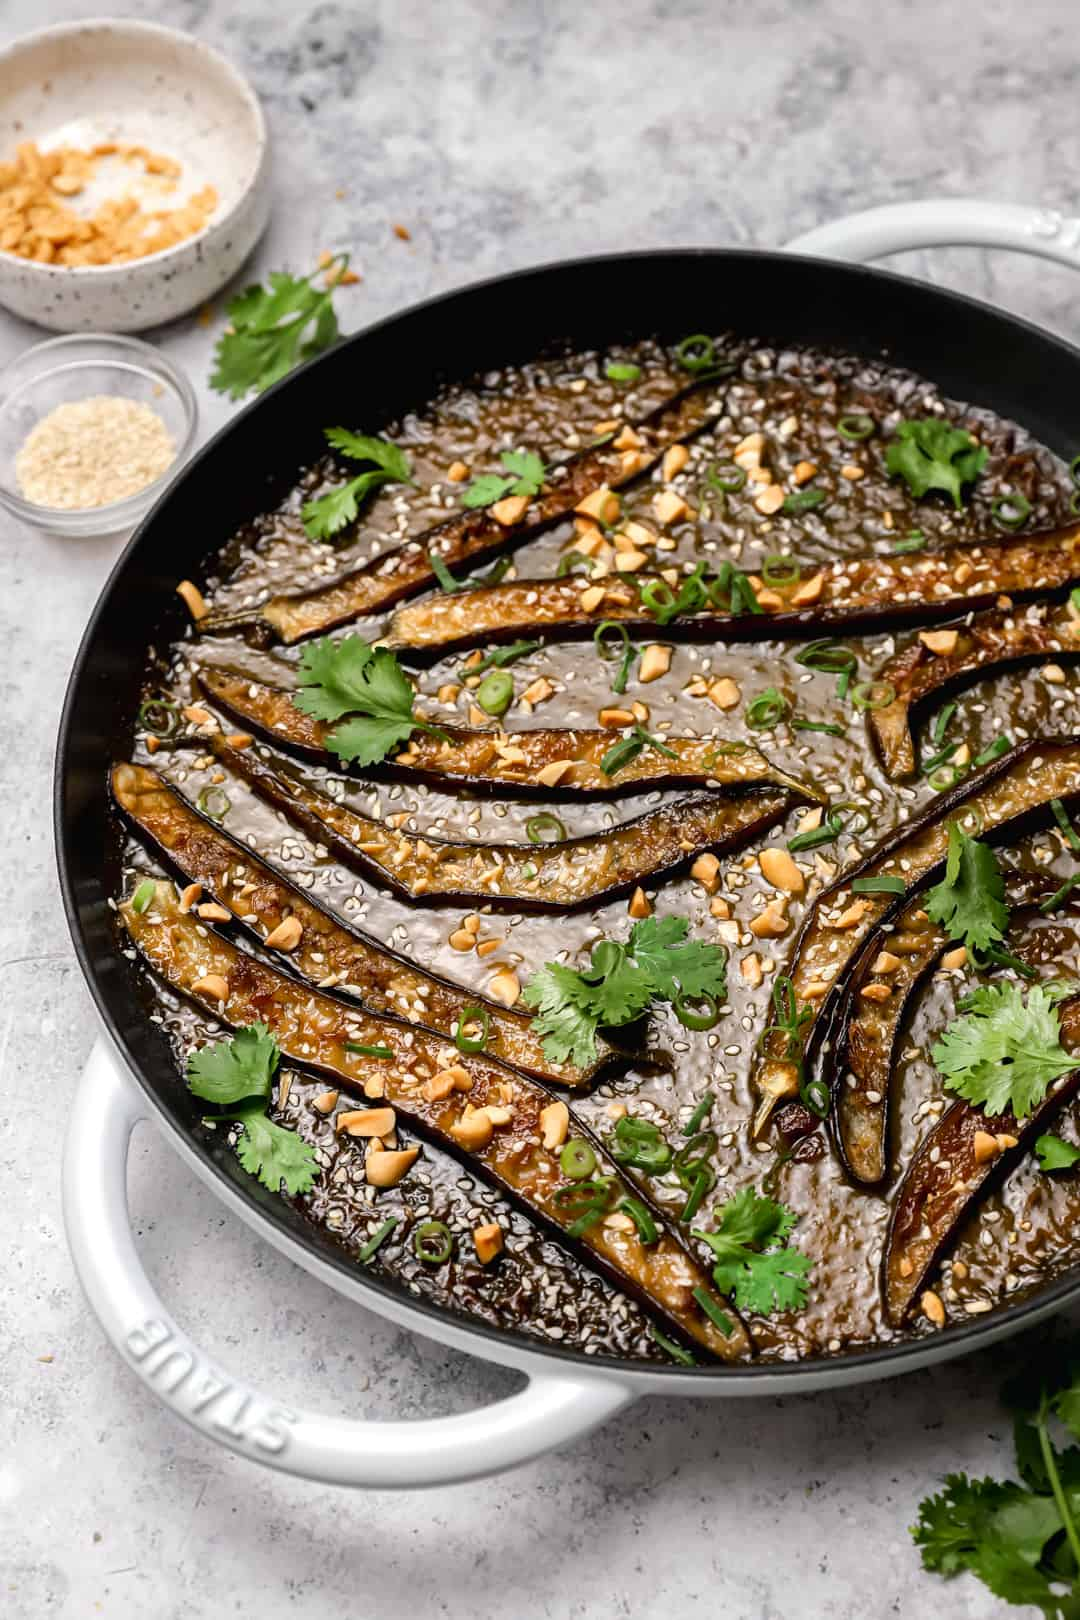 White miso paste eggplant in a pan